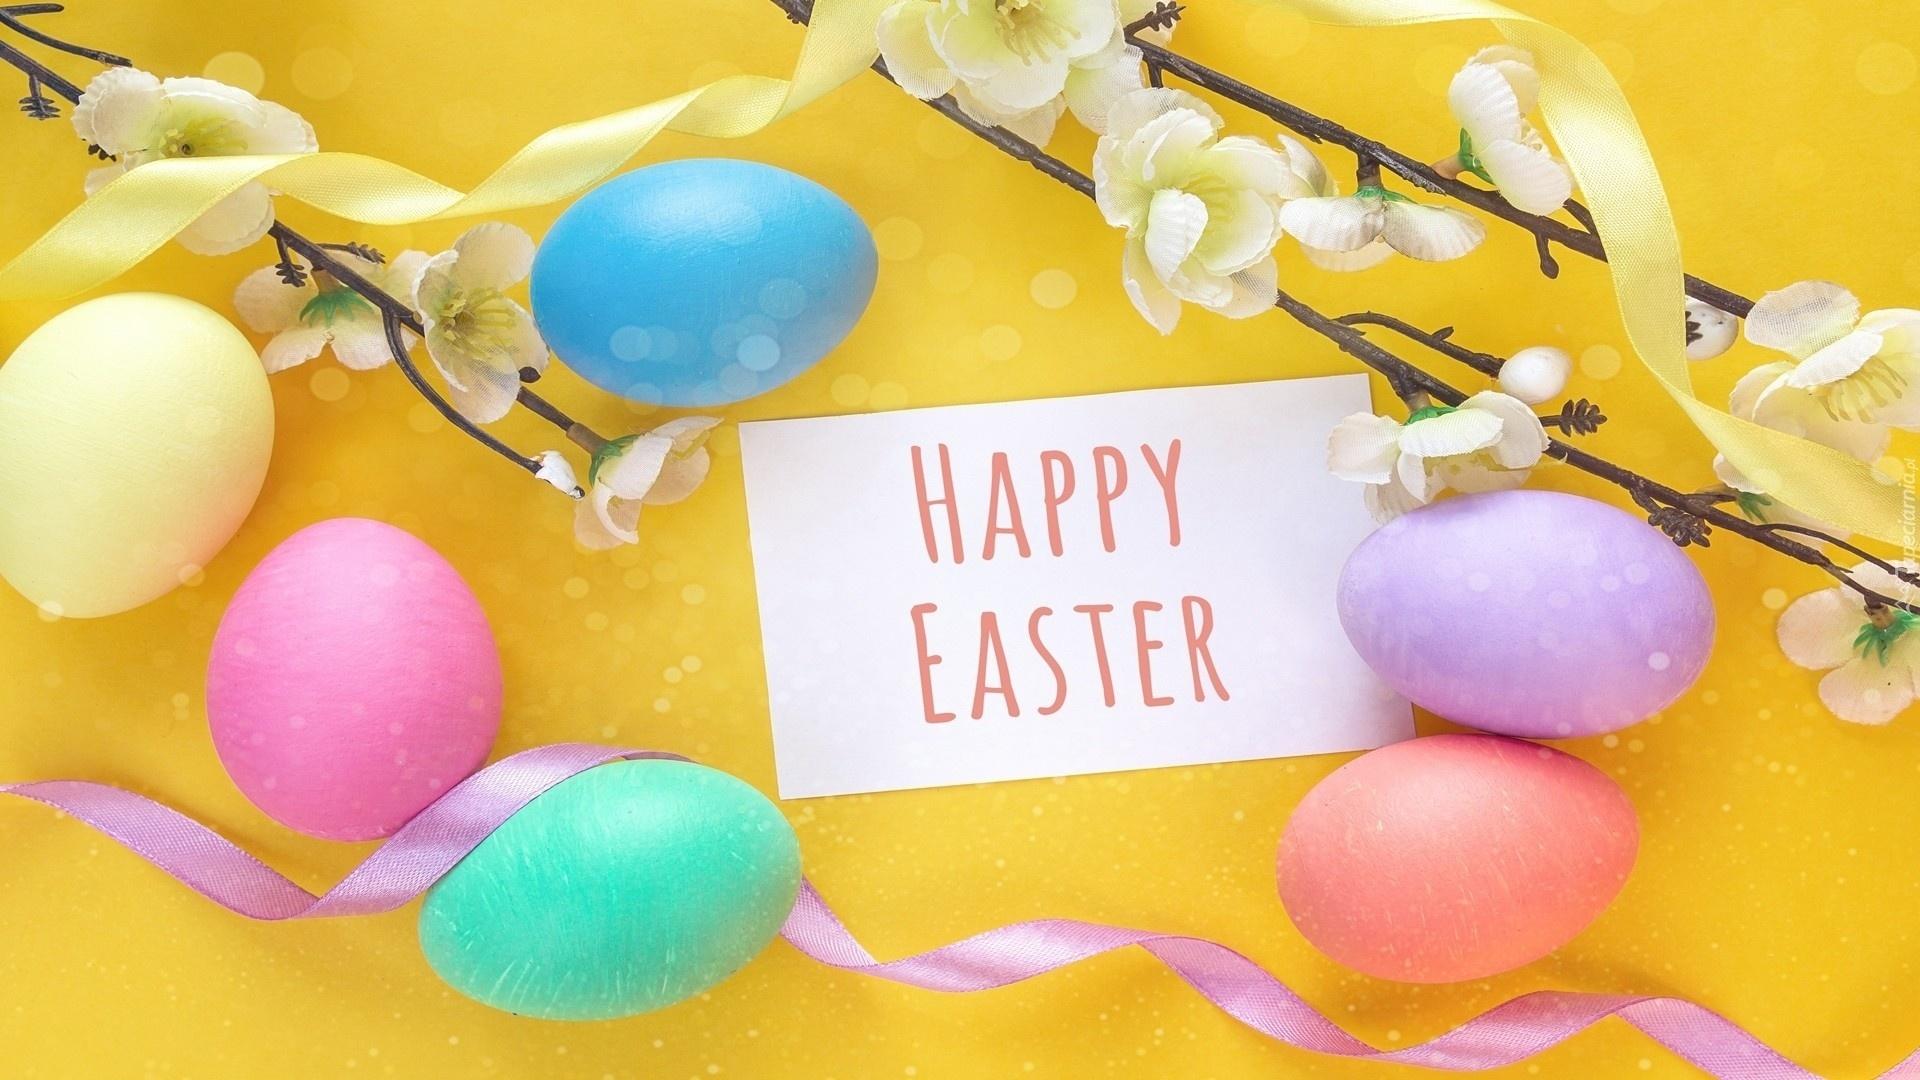 Happy Easter wallpaper for desktop